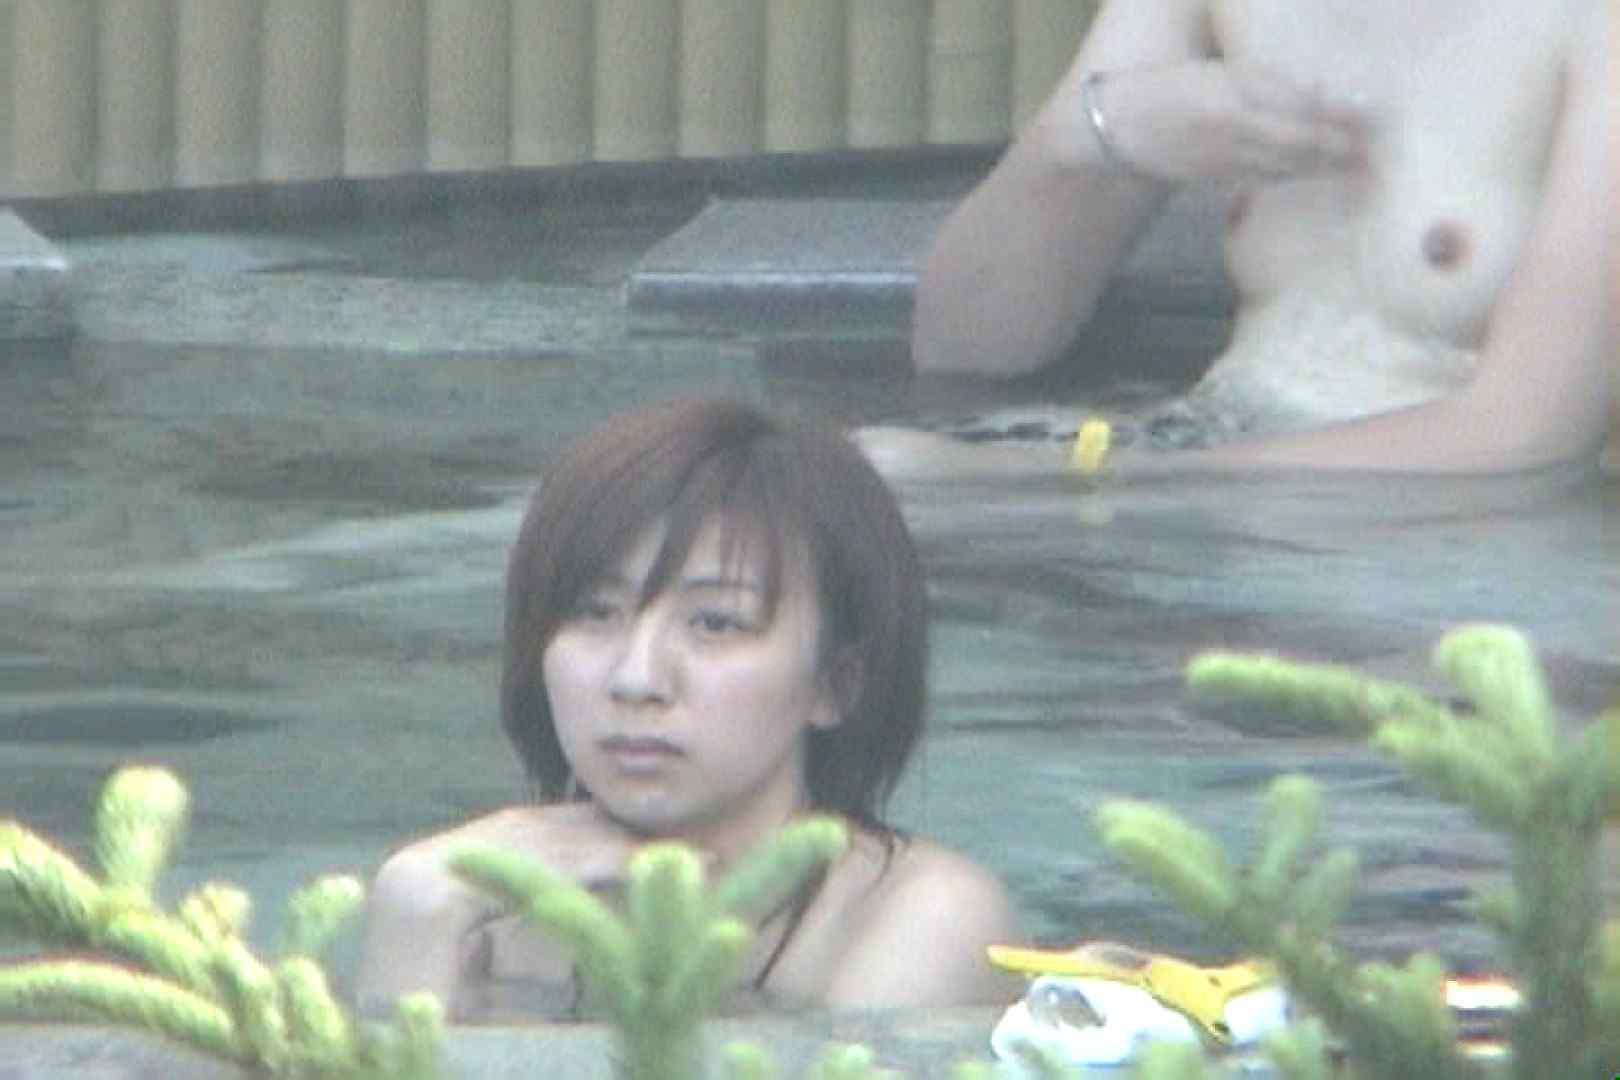 Aquaな露天風呂Vol.77【VIP限定】 盗撮   OLセックス  107画像 7